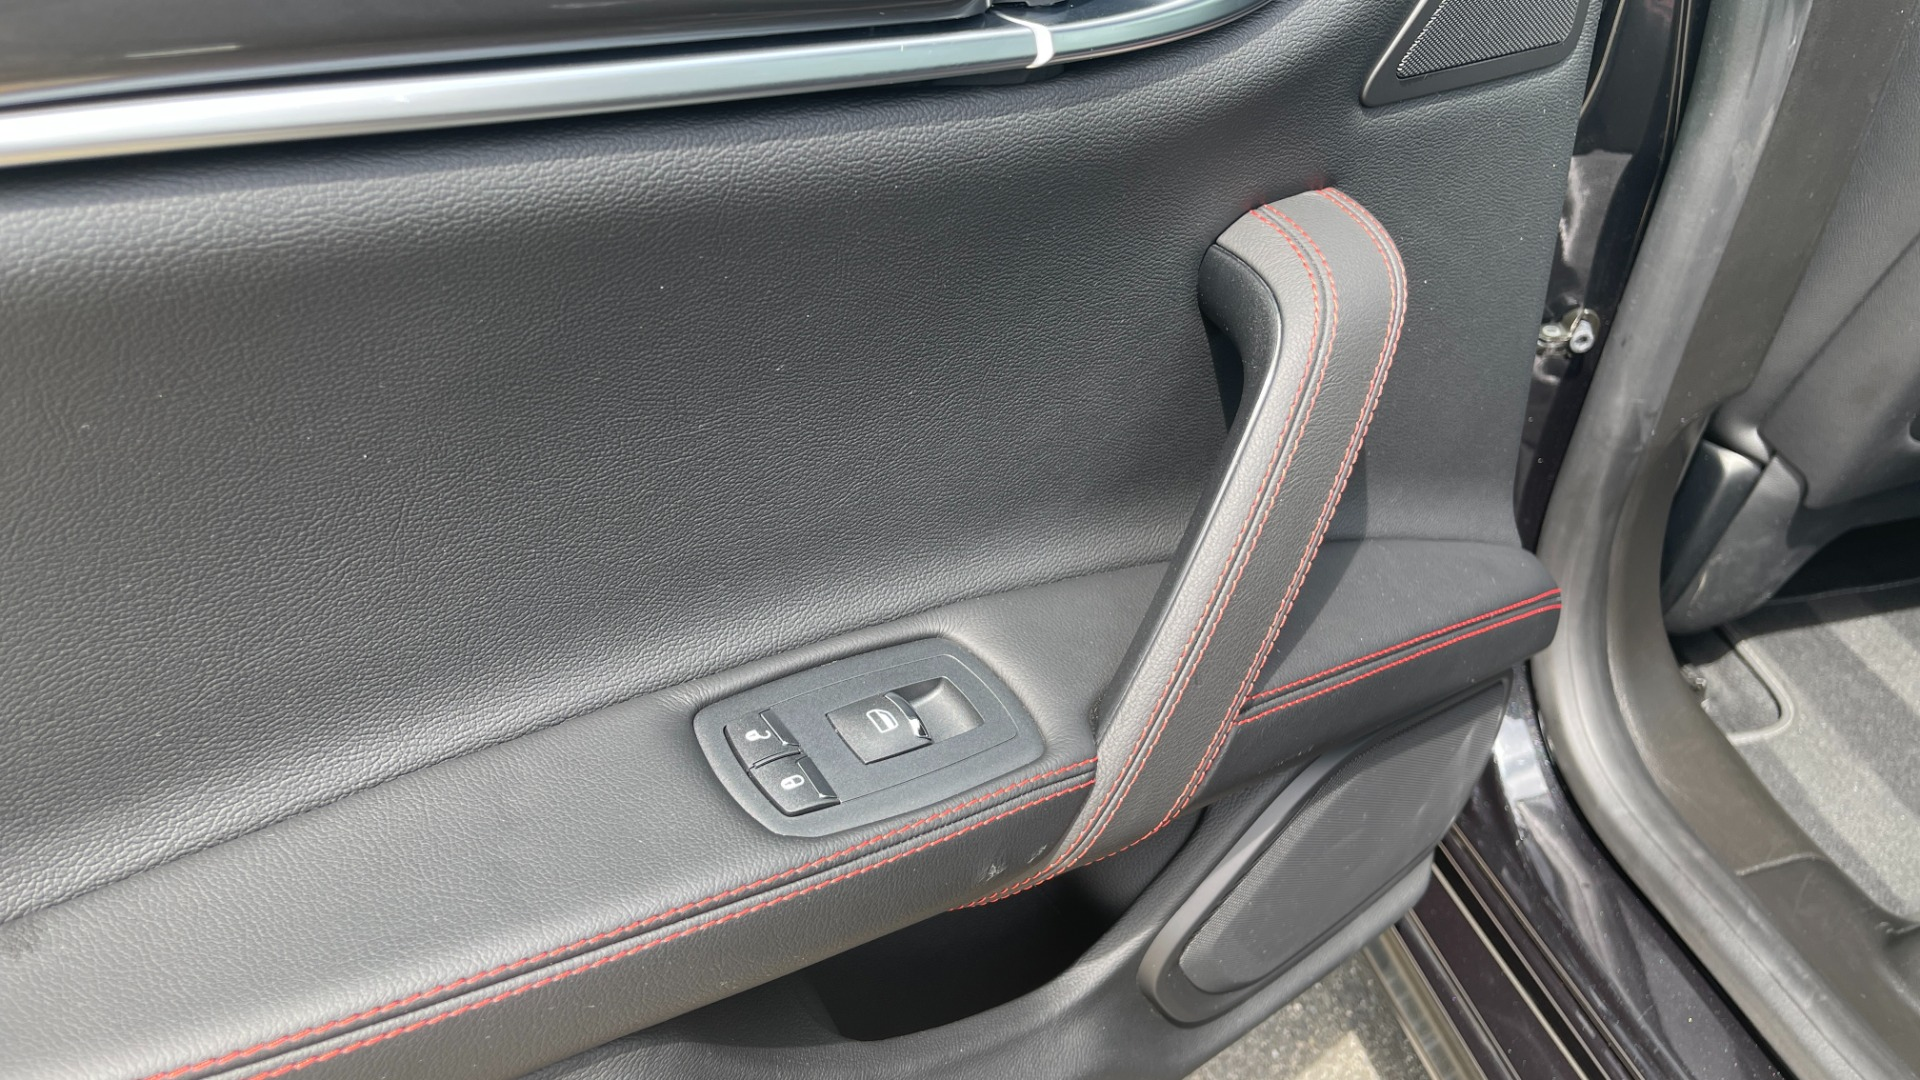 Used 2018 Maserati GHIBLI S Q4 SEDAN / AWD / 3.0L V6 / SUNROOF / NAV / REARVIEW for sale $51,995 at Formula Imports in Charlotte NC 28227 47